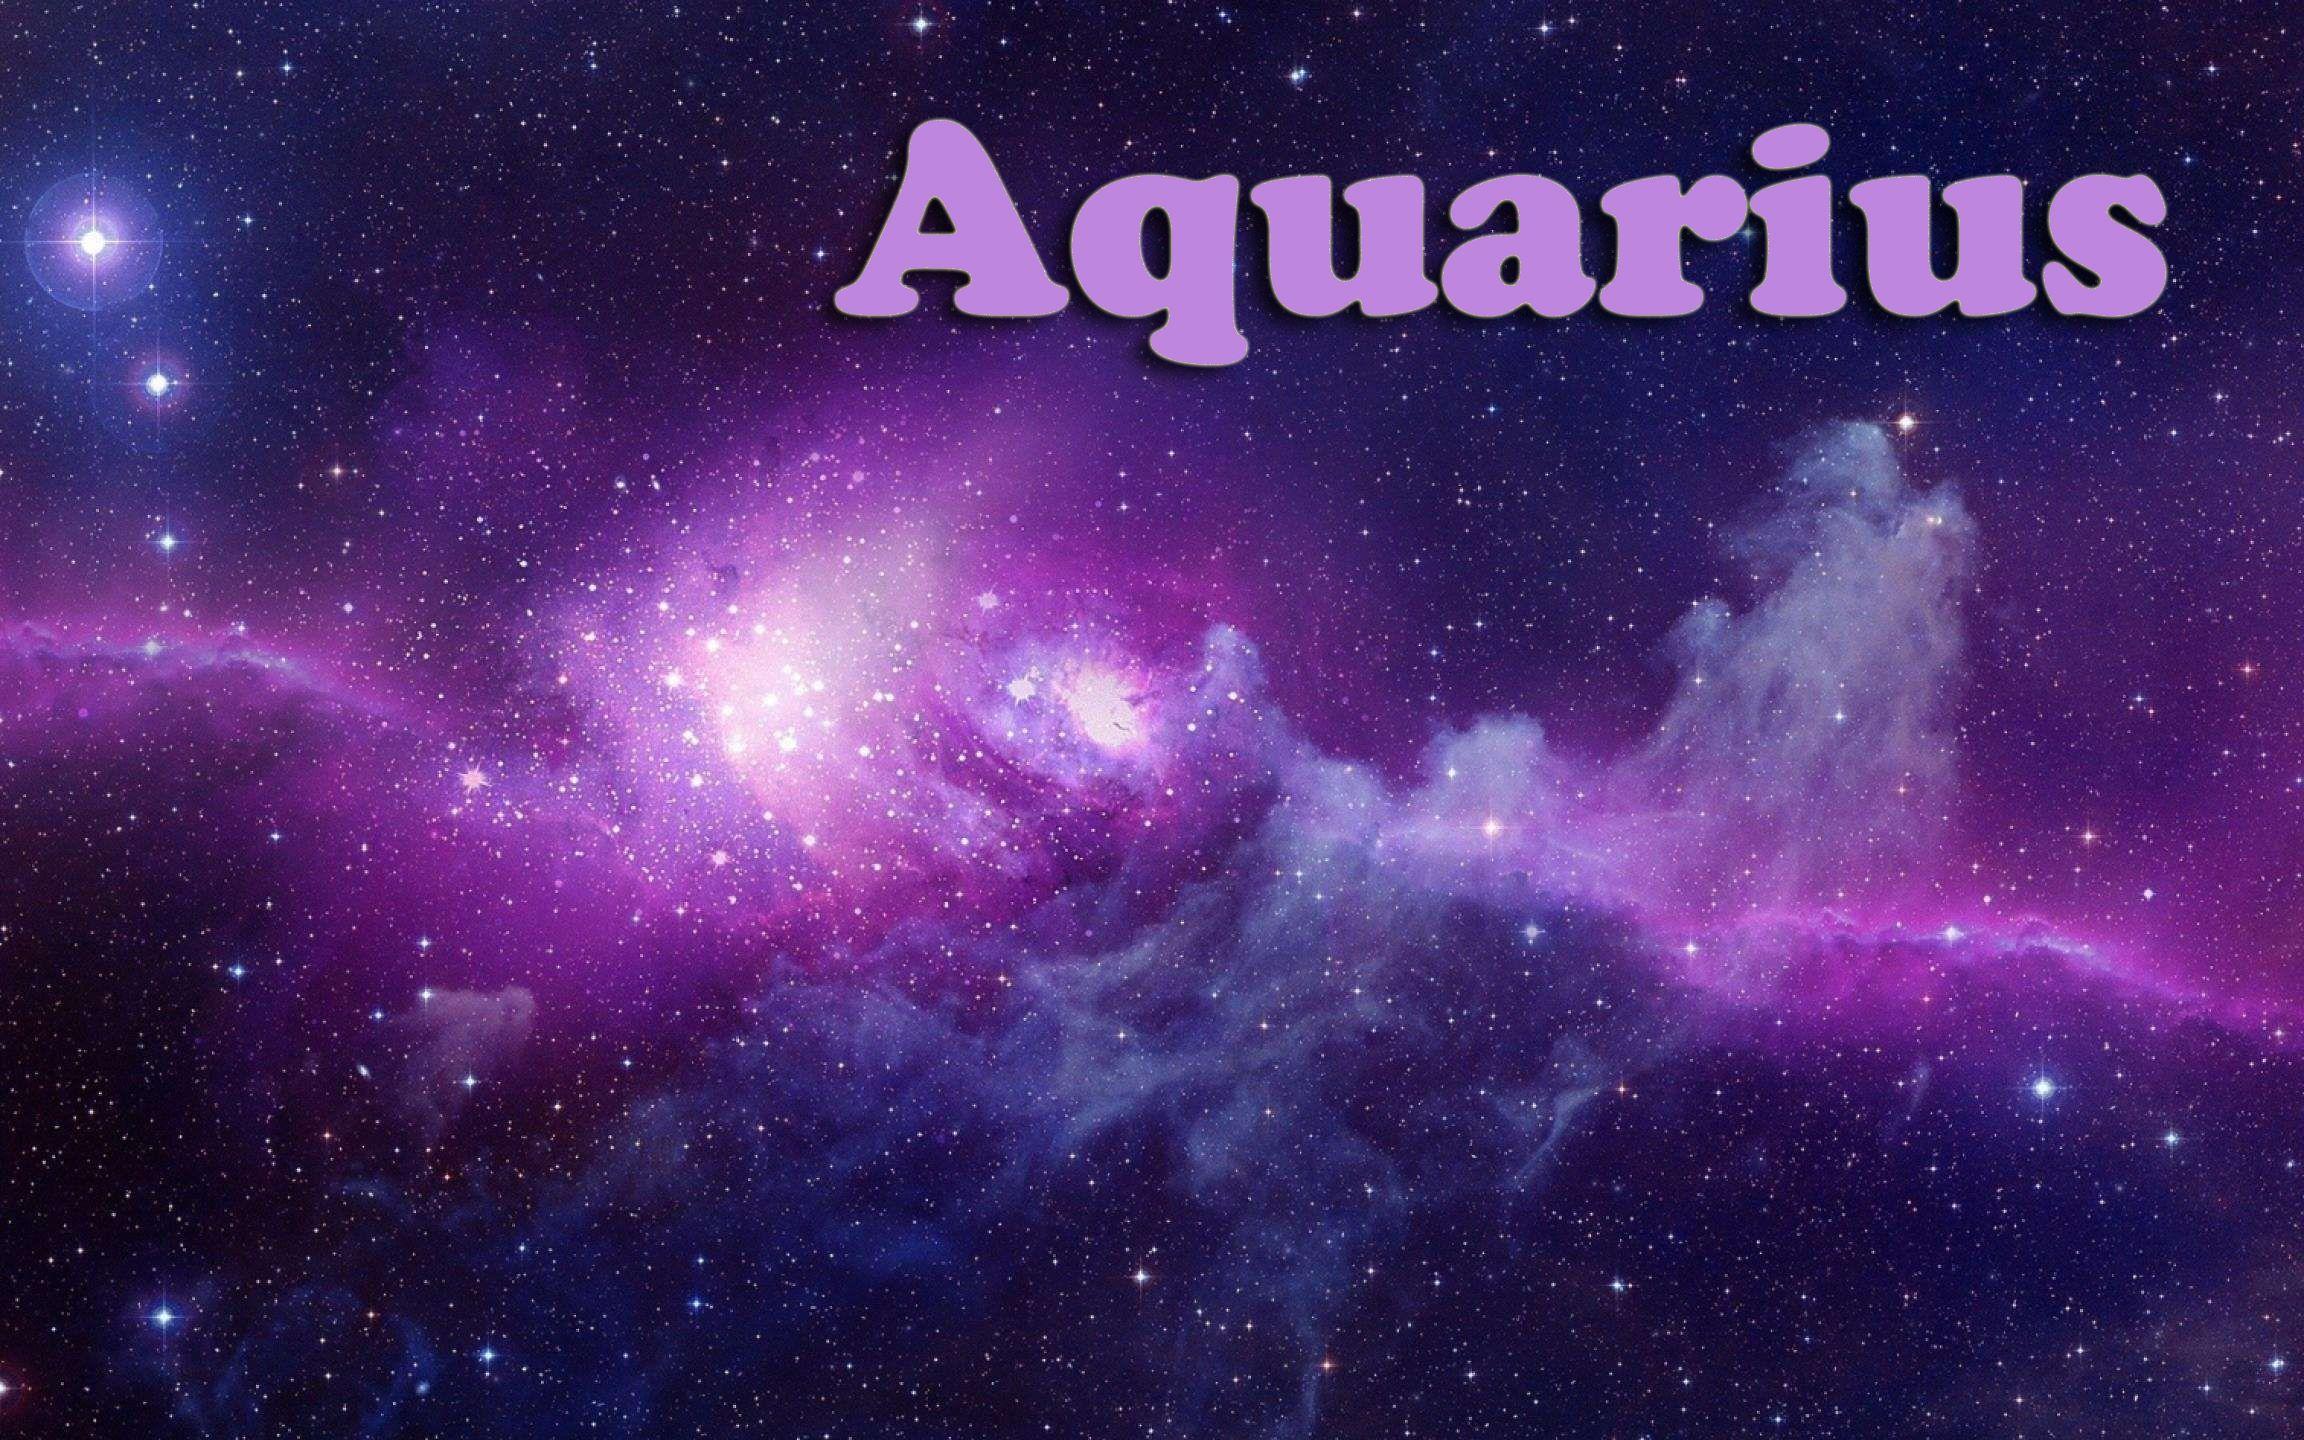 aquarius_水叮当神曲aquarius(水瓶座)翻唱 by大耳朵